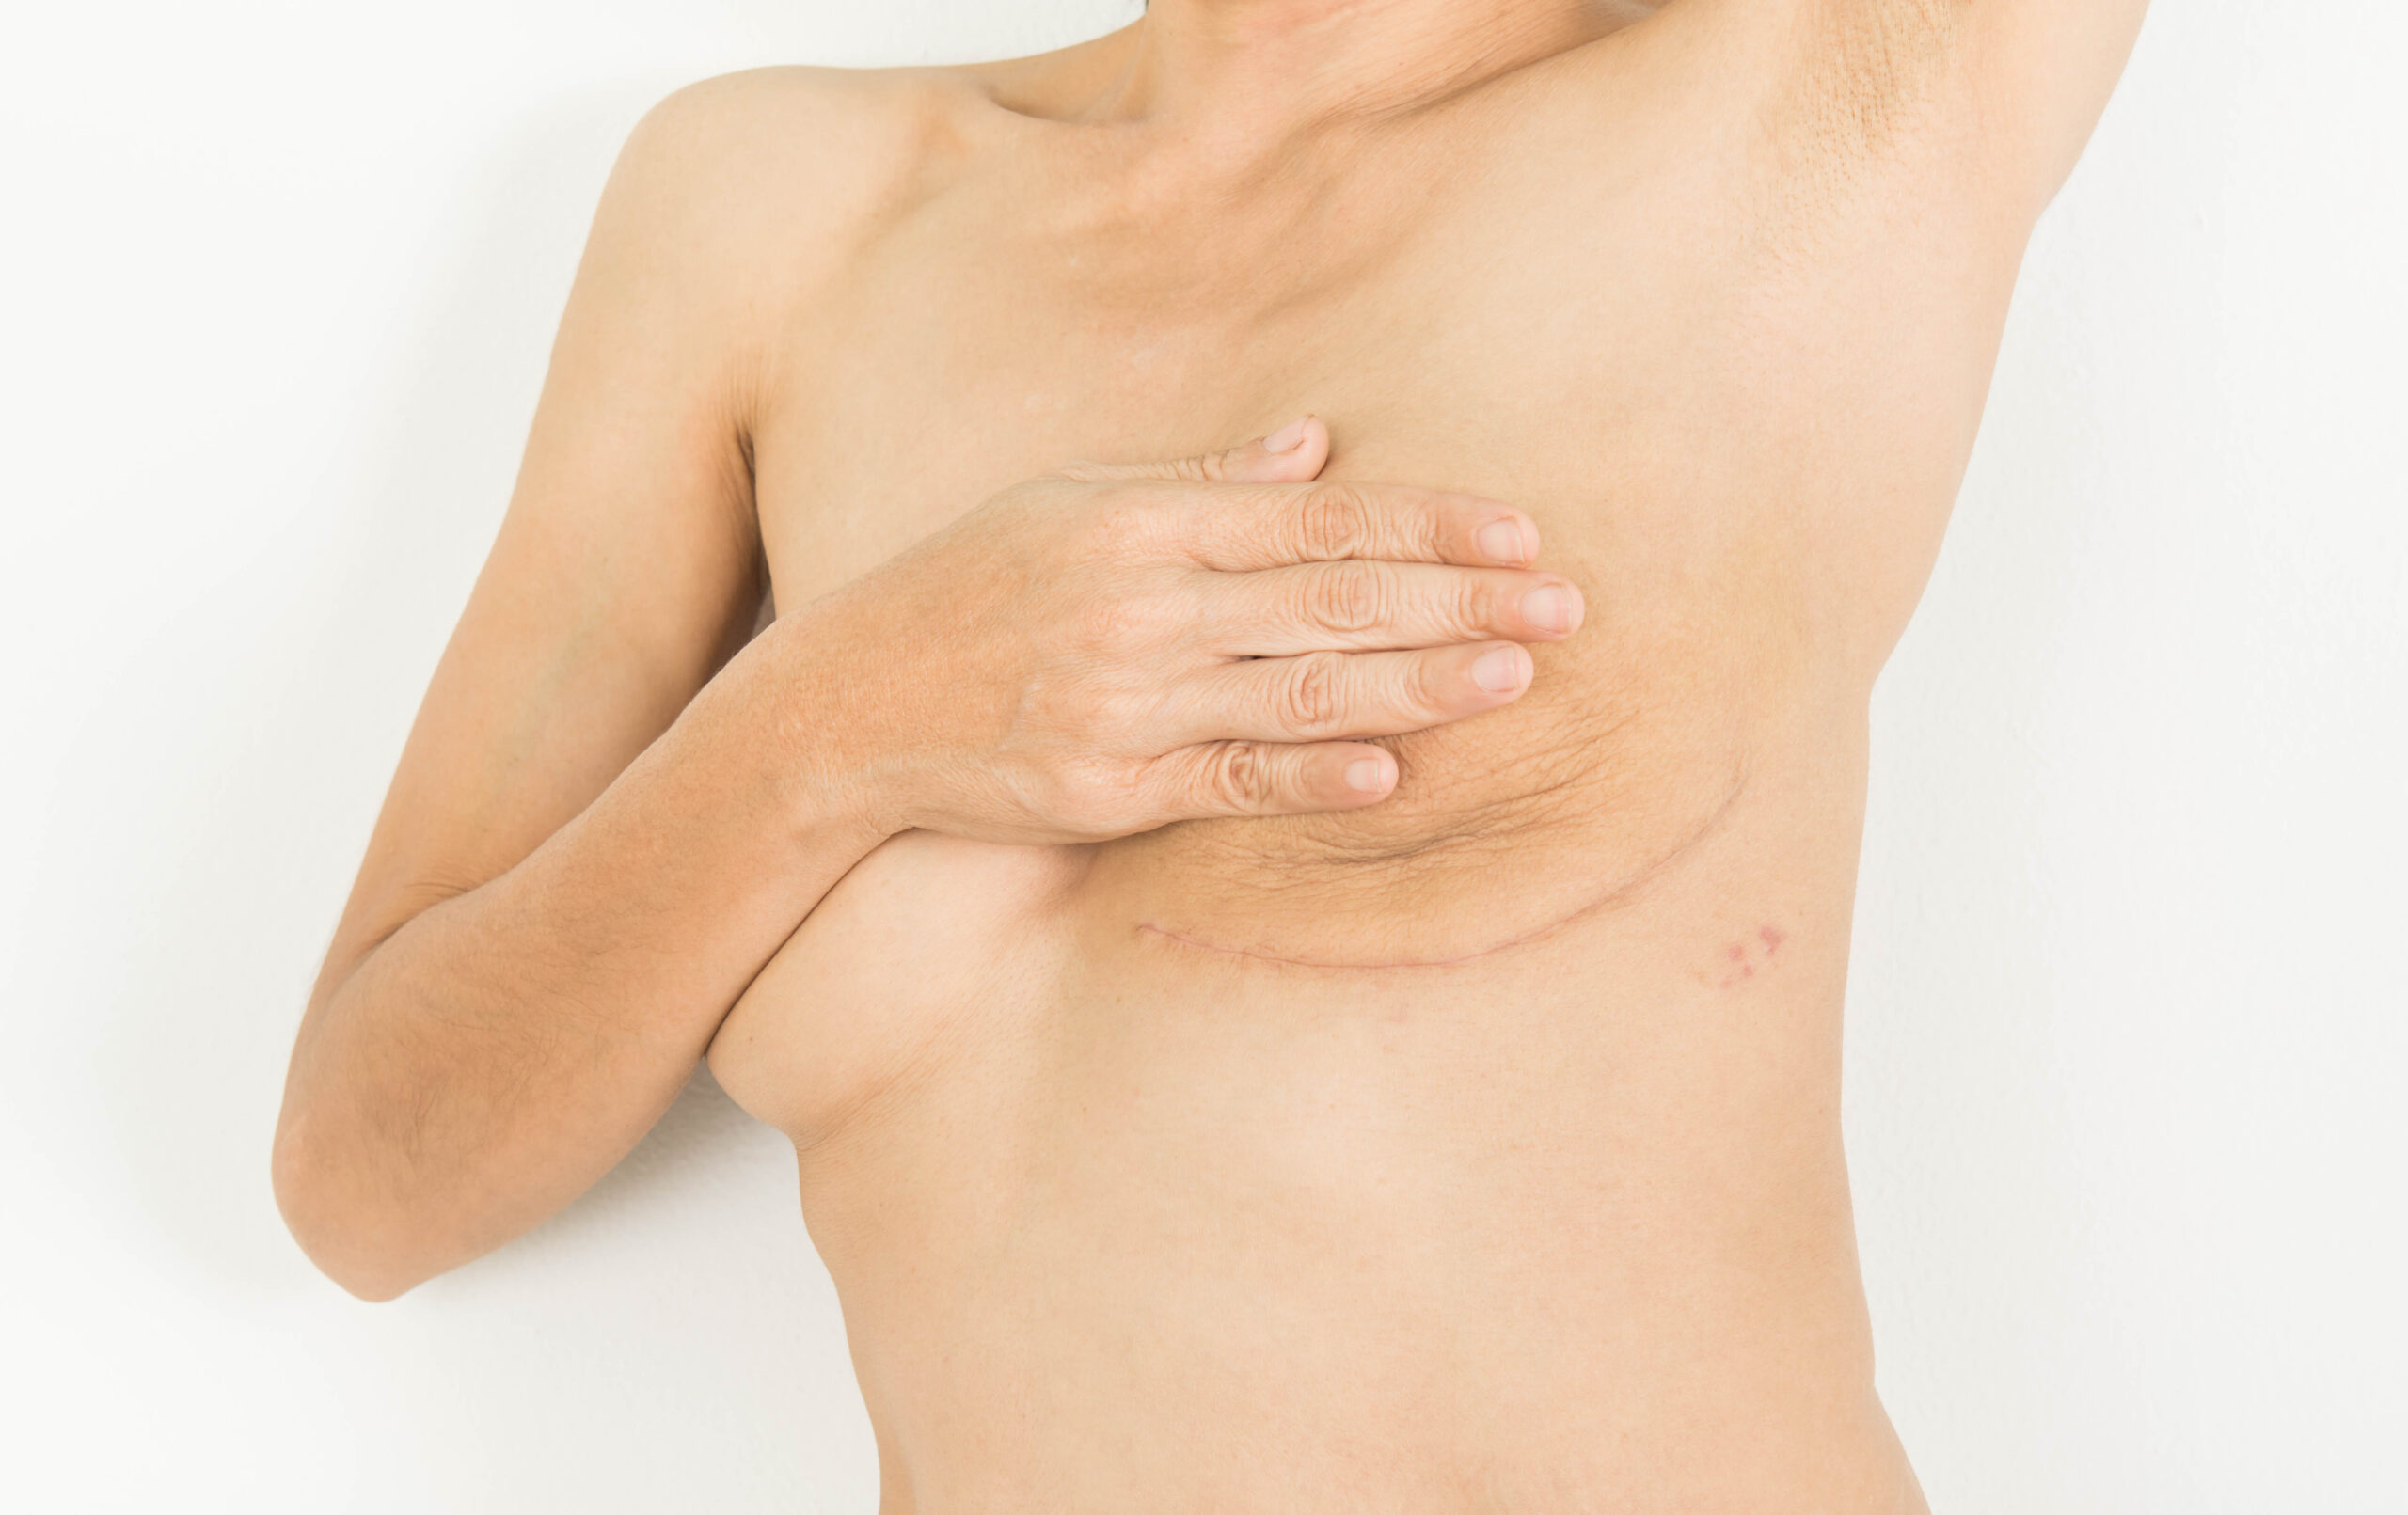 breast reconstruction, plastic surgeons Vancouver, SkinOne